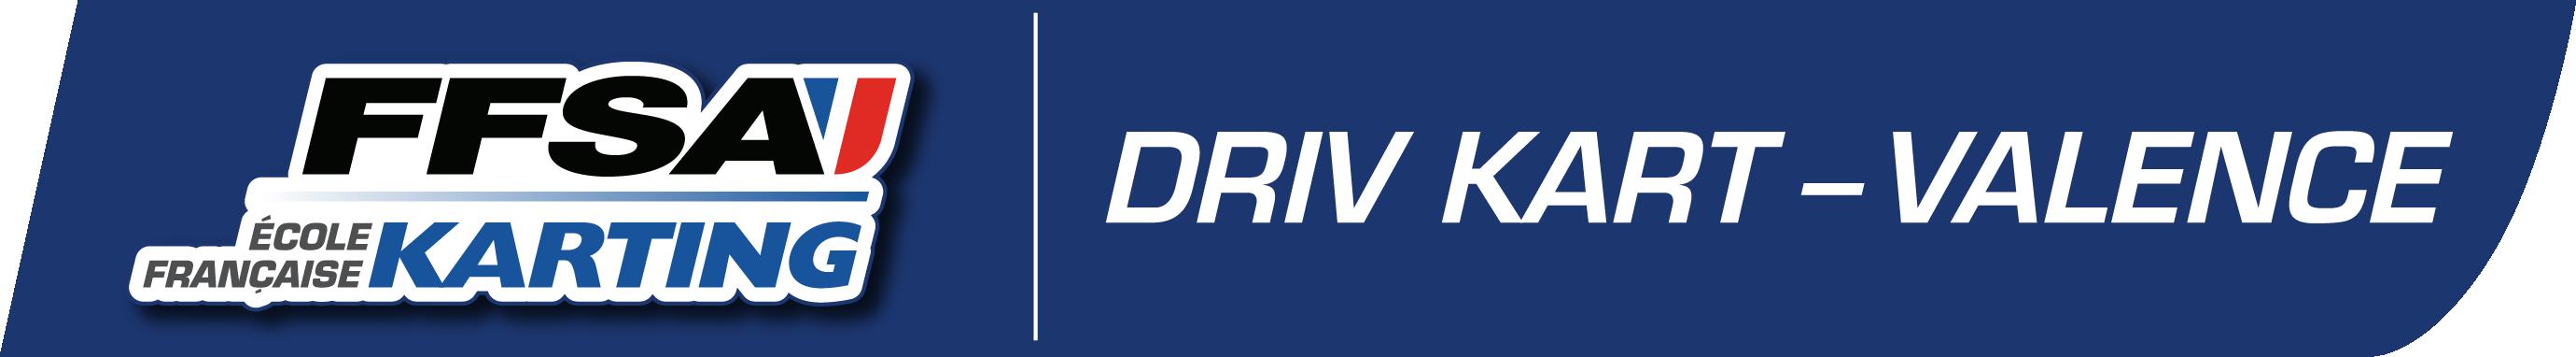 EFK DrivKart Valence